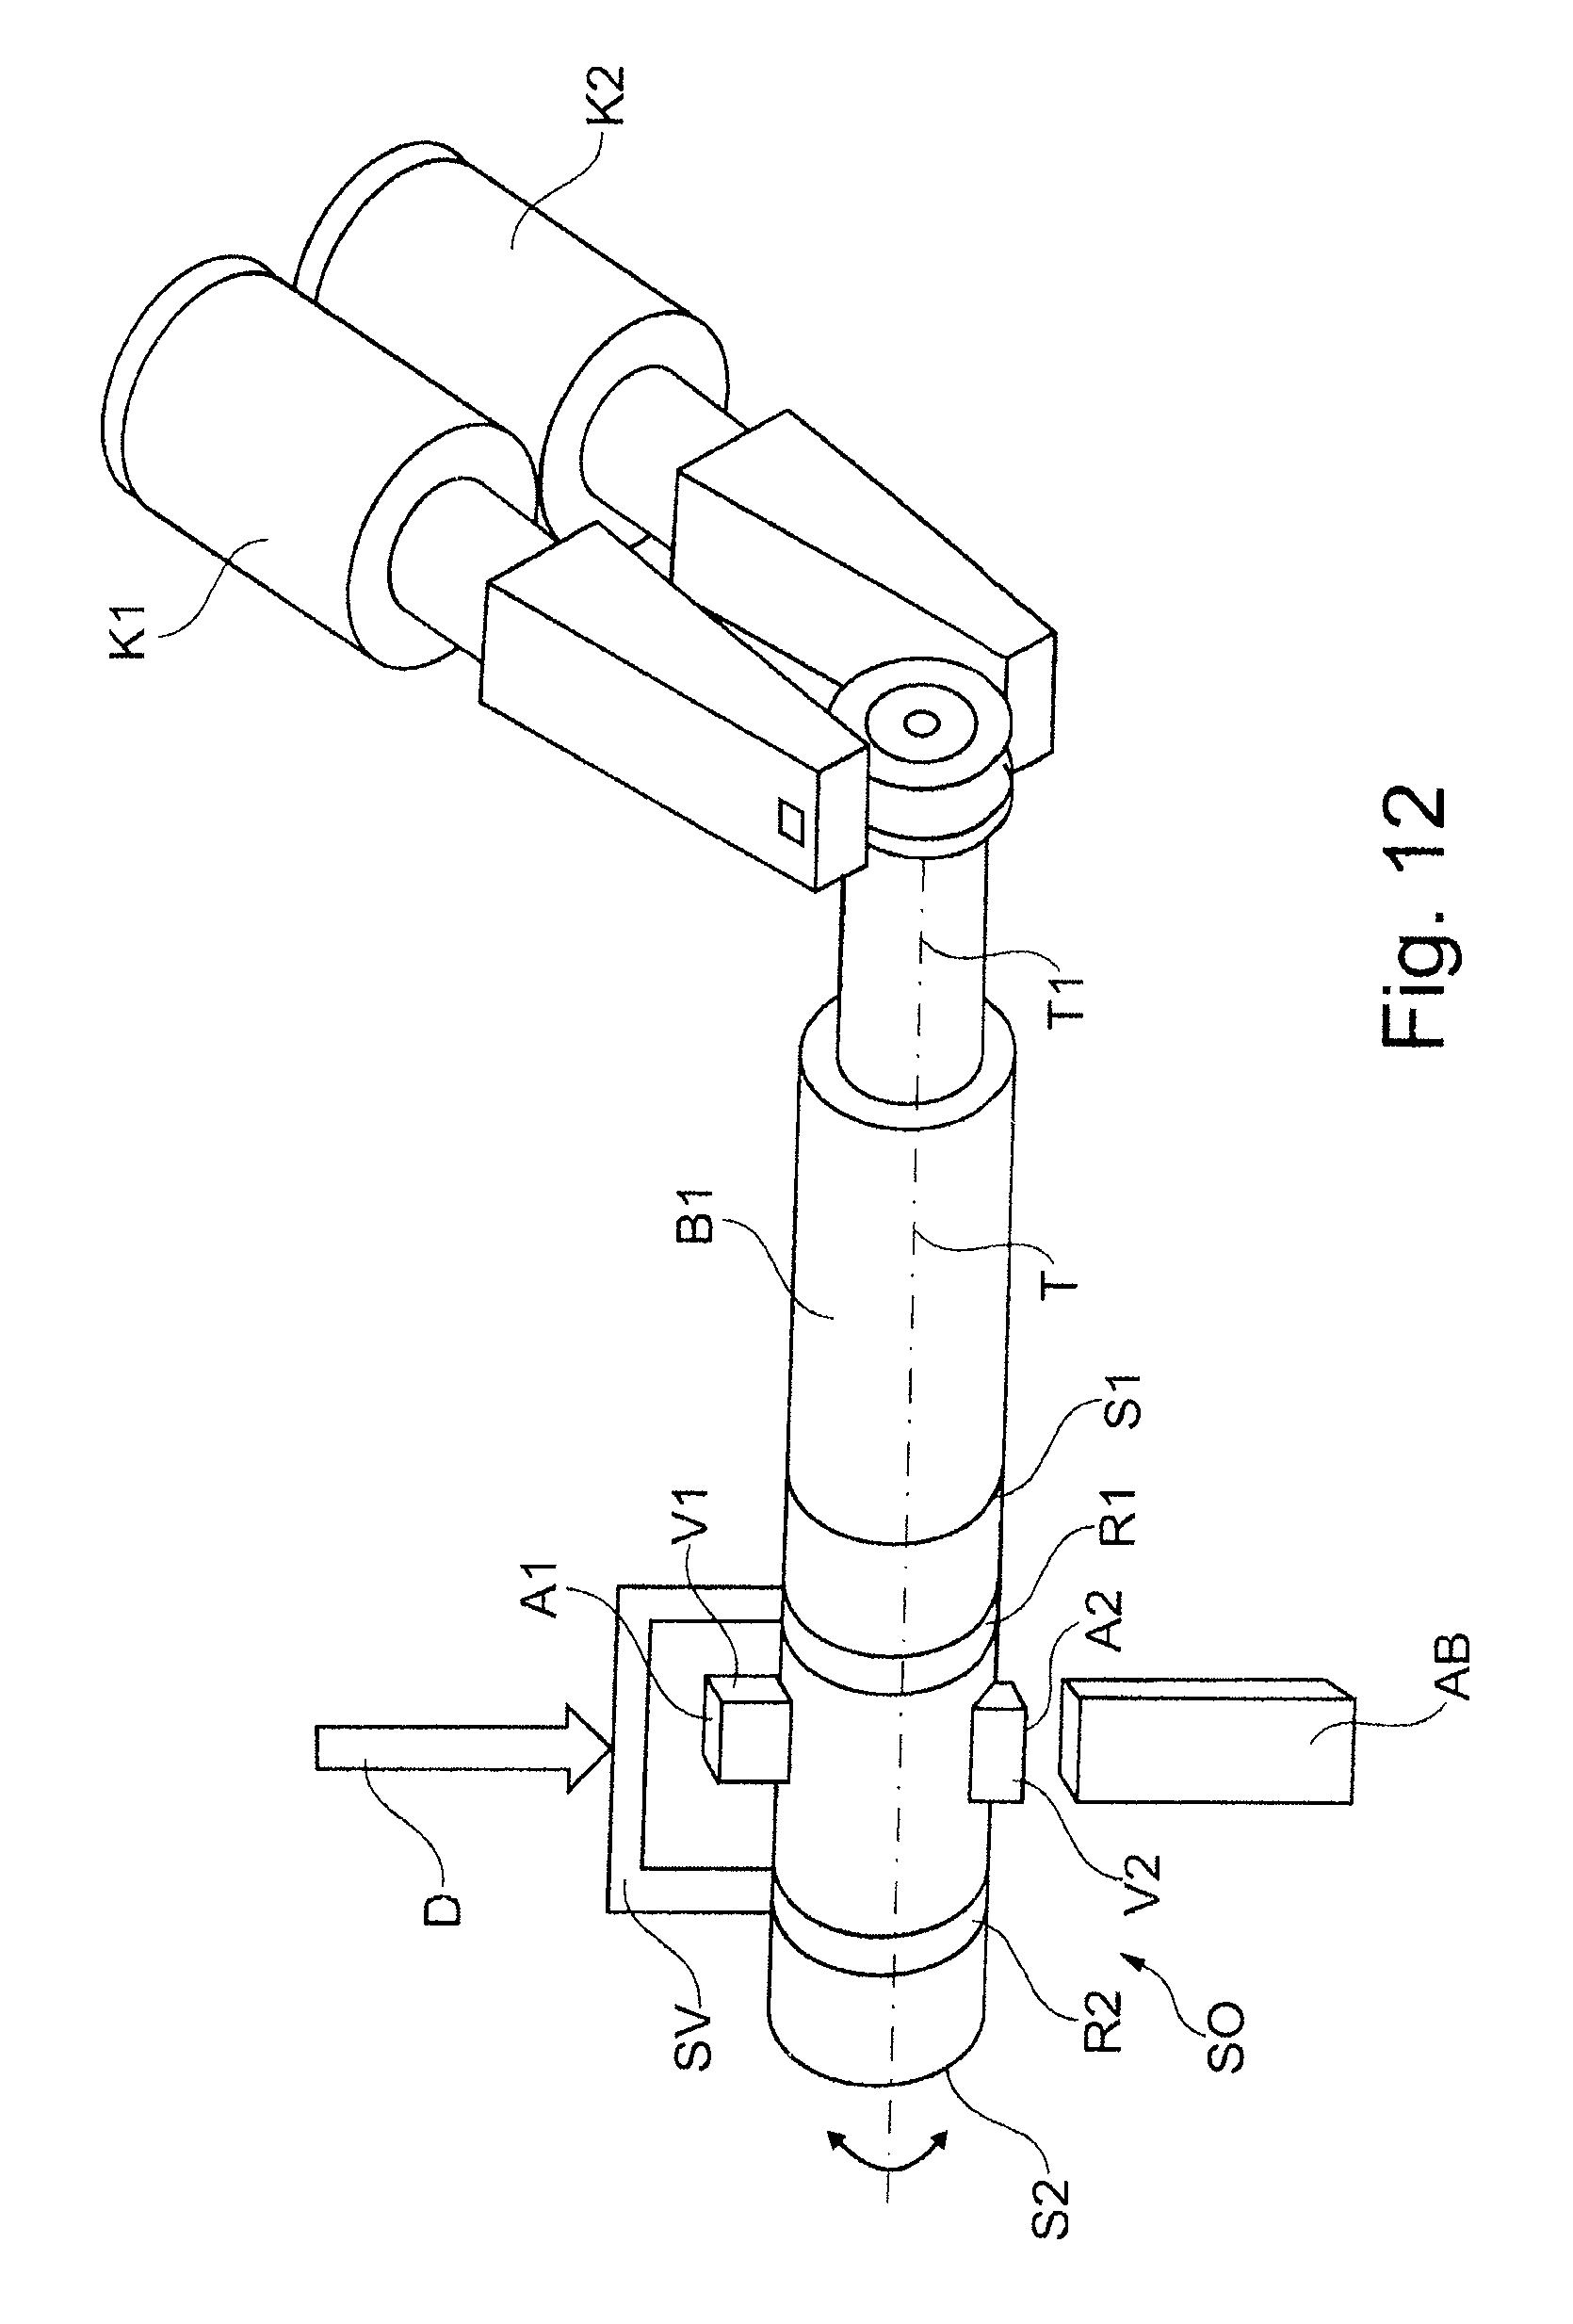 Modern wiring diagram for 94 hondsa fourtrax 300 mold diagram